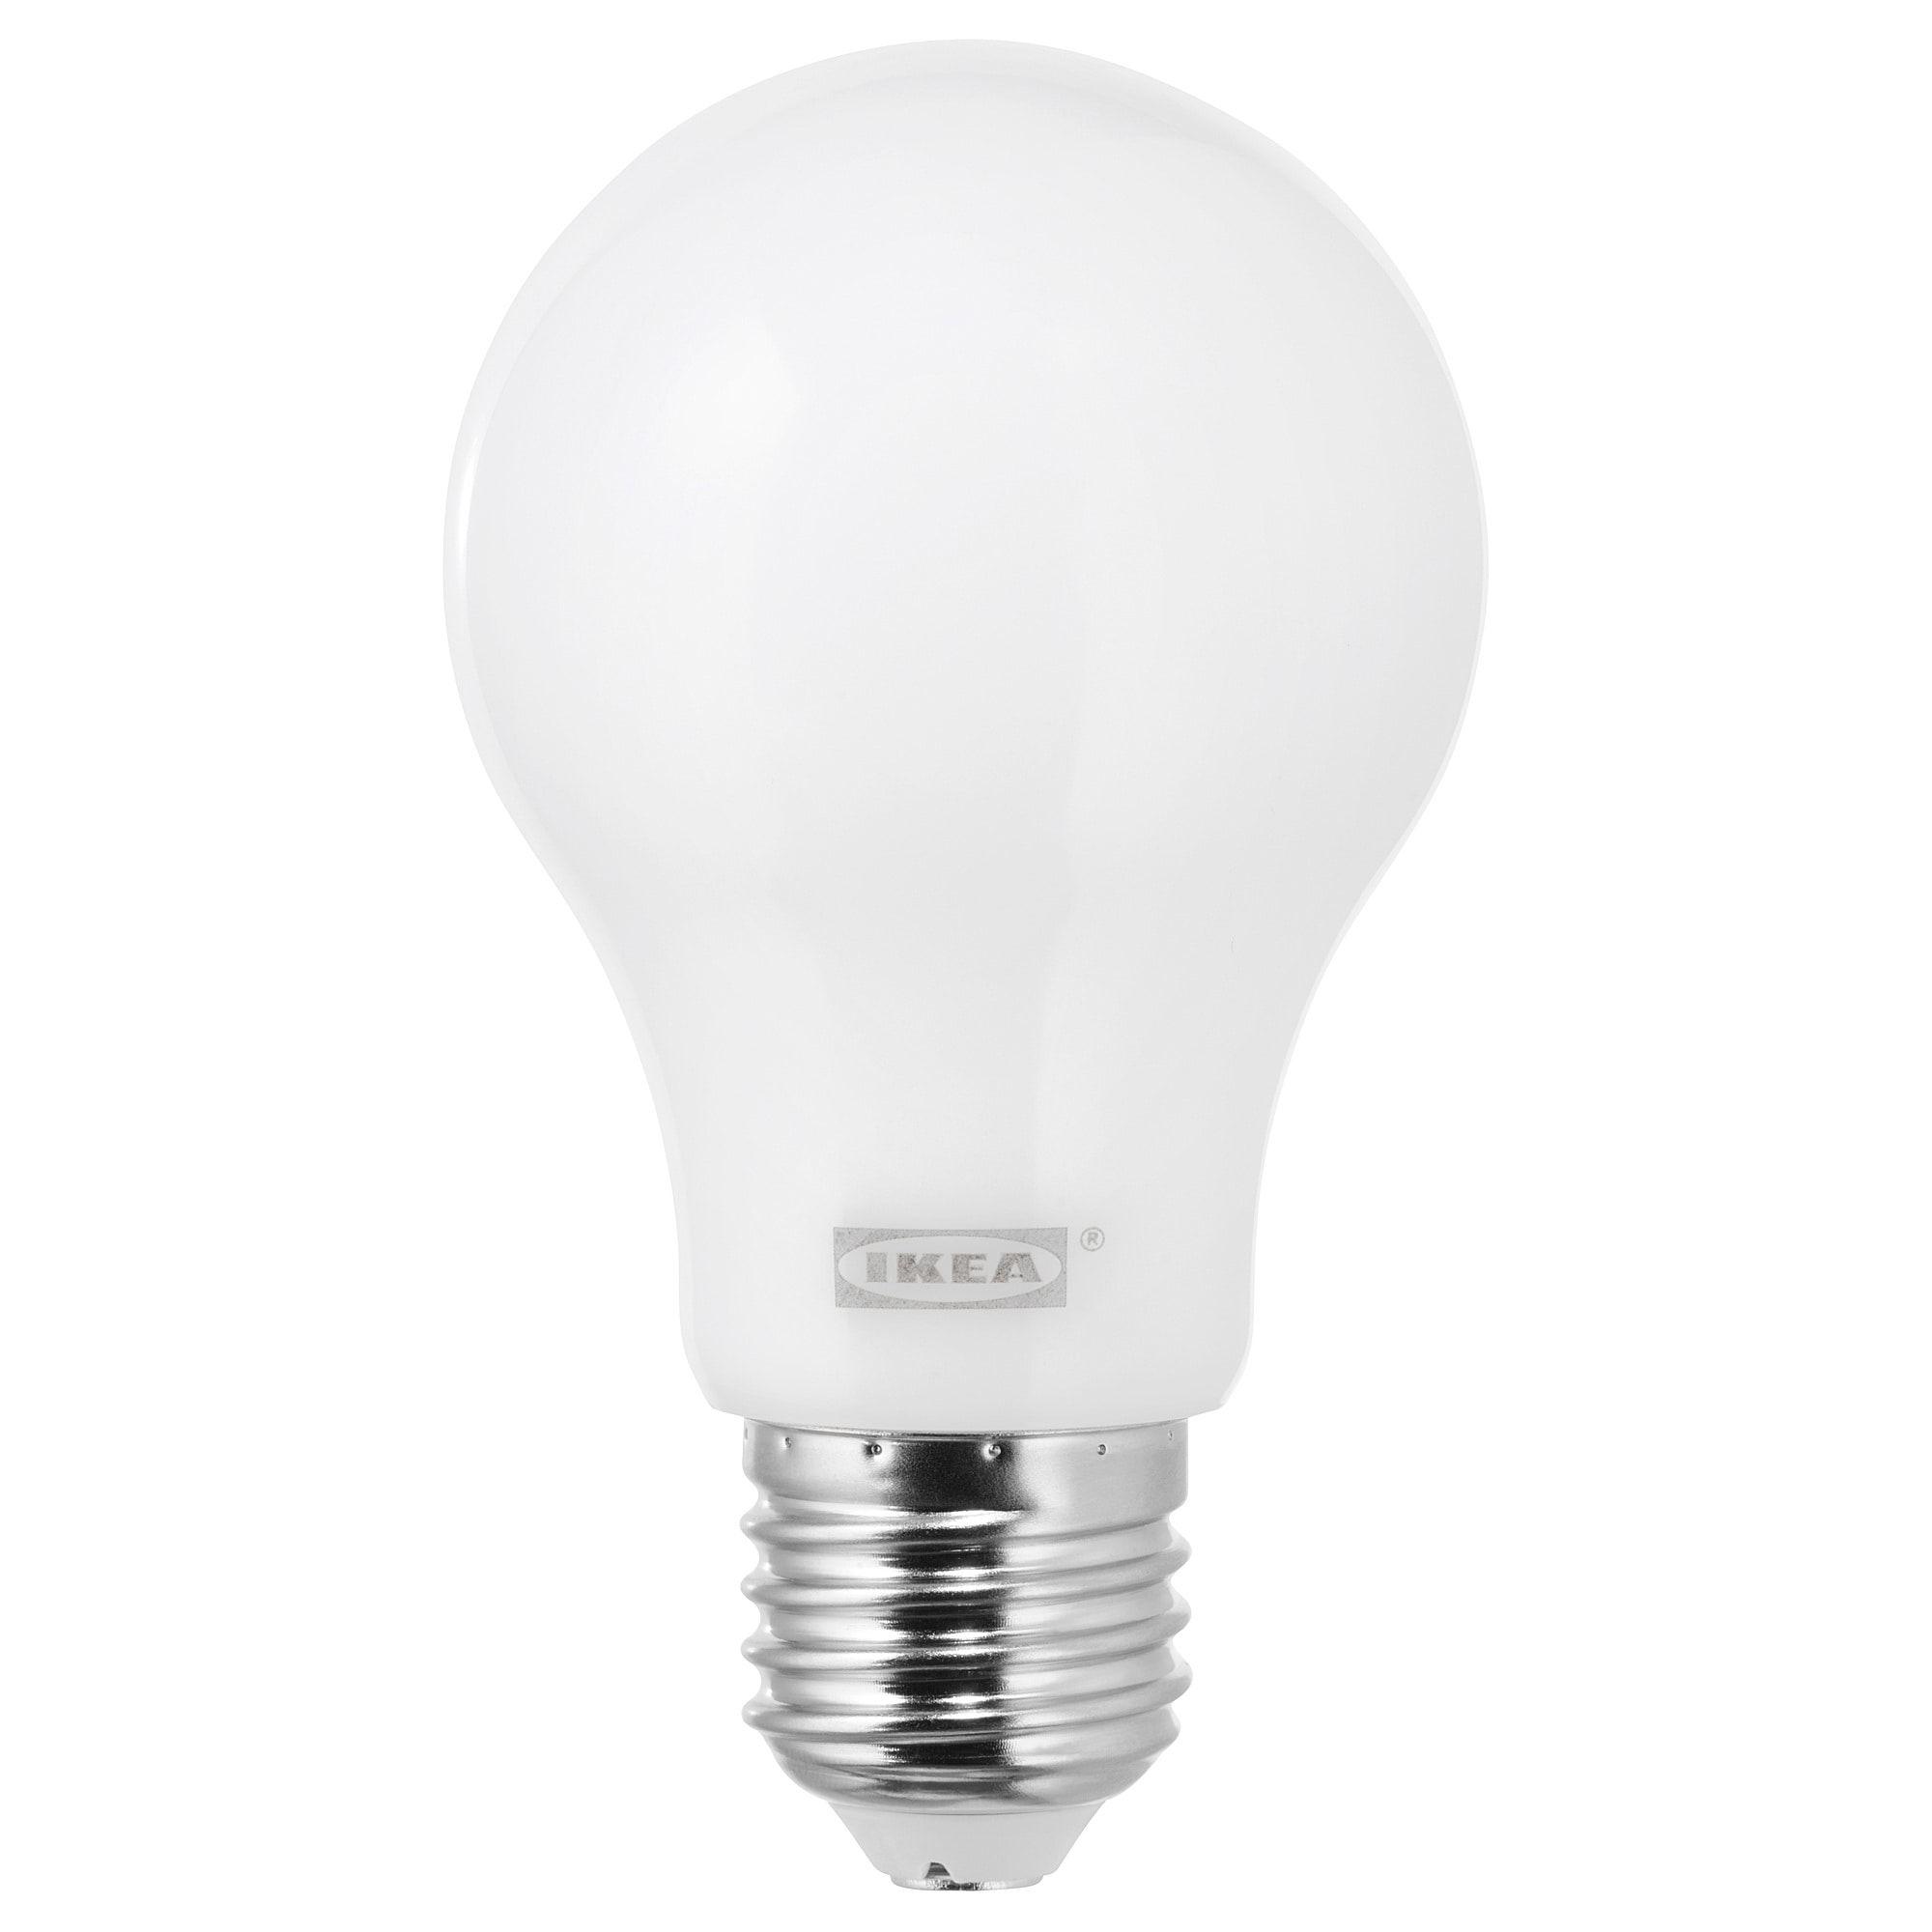 Ledare Led Leuchtmittel E27 600 Lm Dimmbar Dimmbar Warm Rund Opalweiss Ikea Osterreich Led Leuchtmittel Ikea Led Leuchtmittel